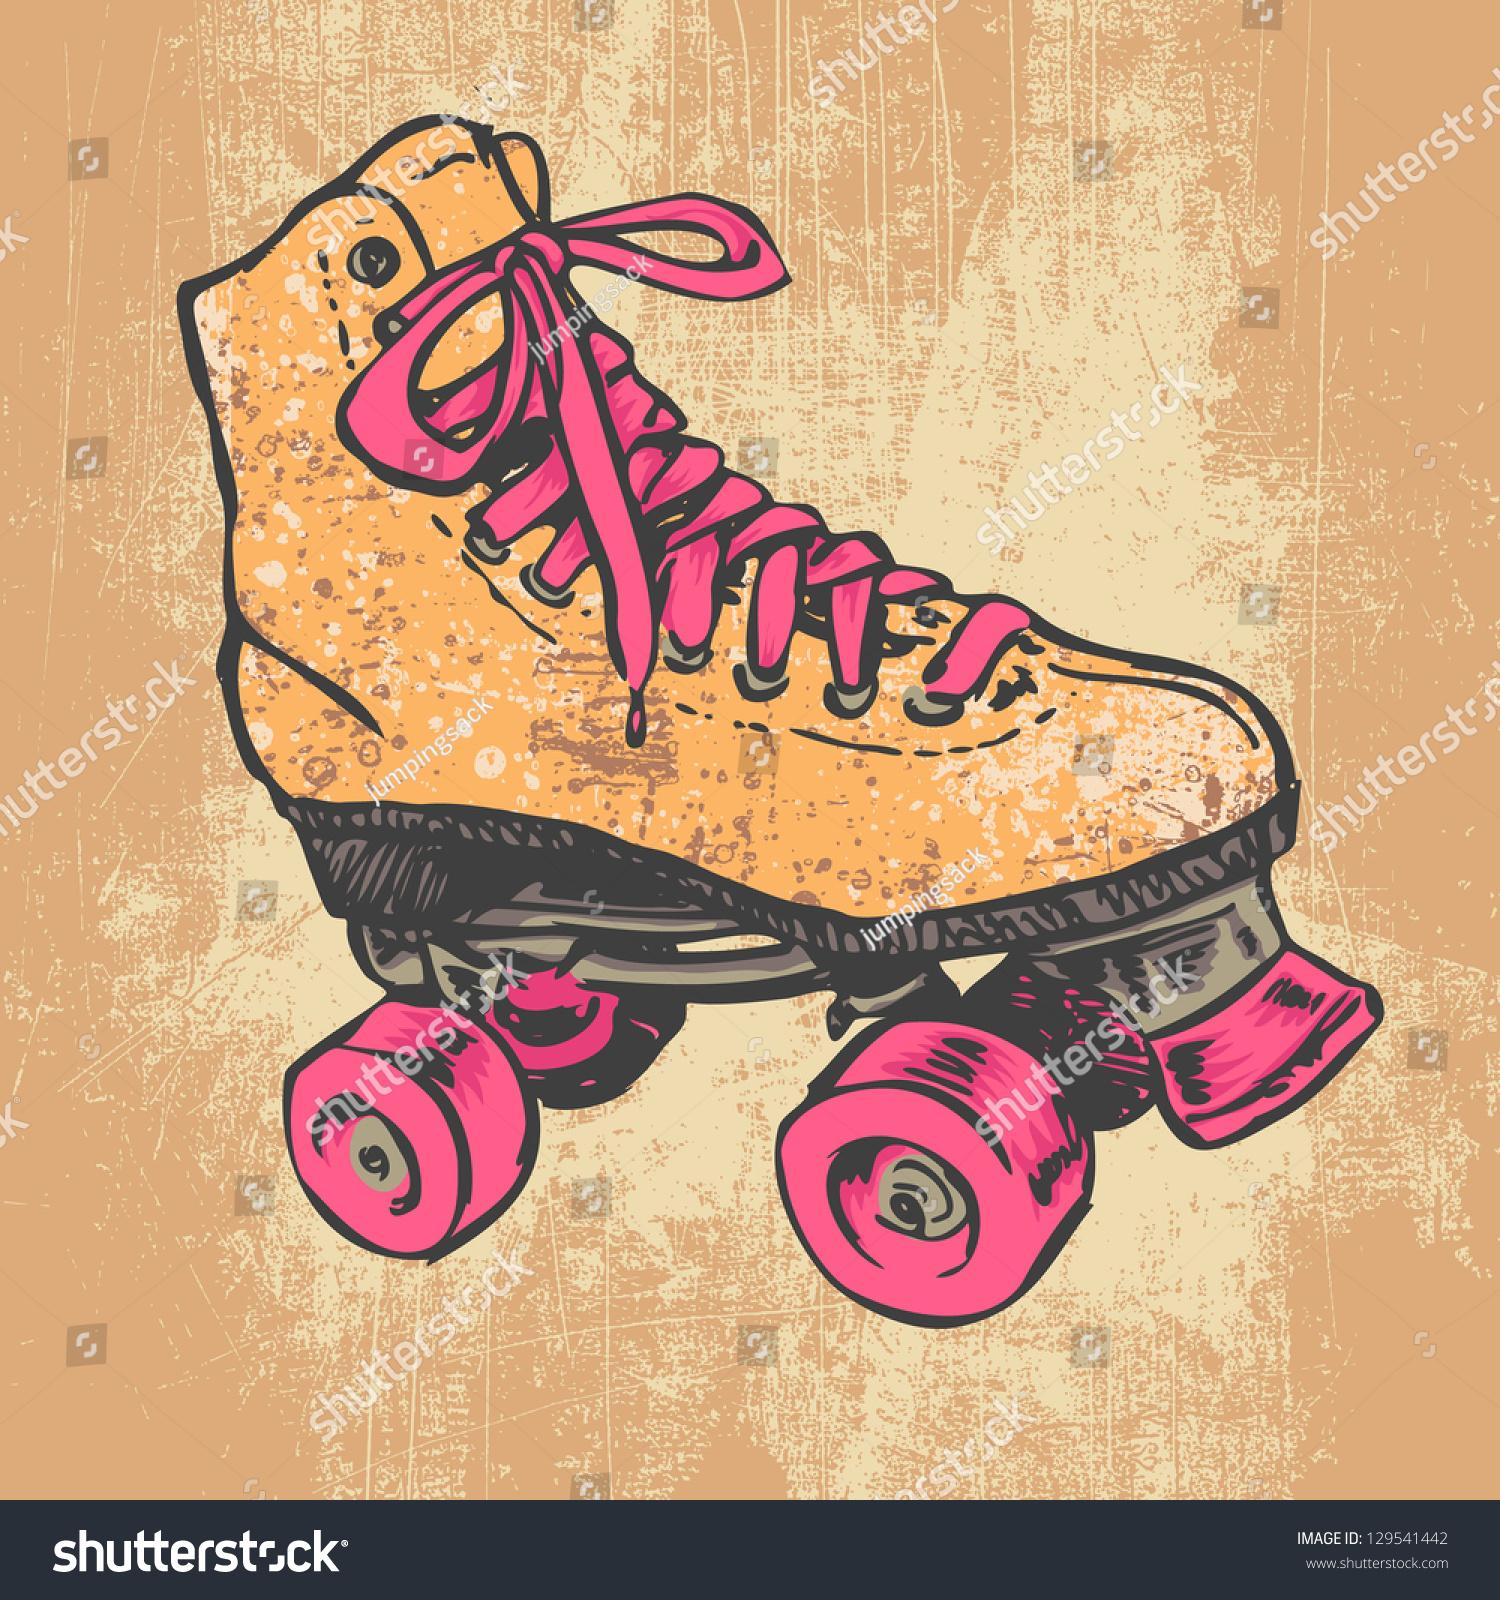 Retro roller skate grunge texture background stock vector for Imagenes retro vintage